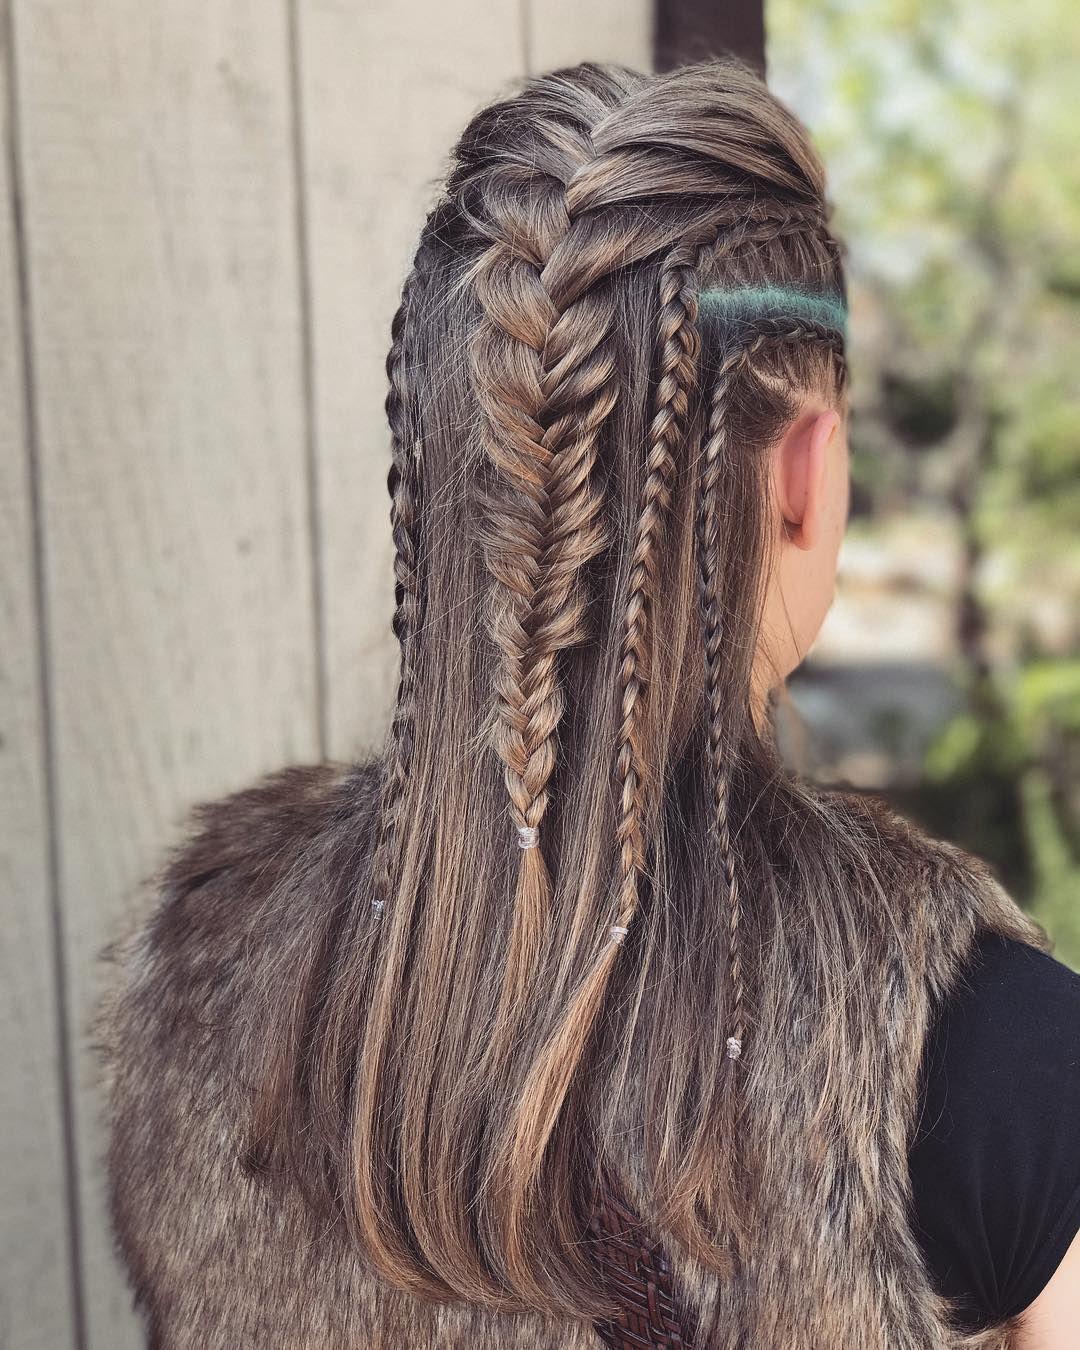 20 Looks de cabello inspirados en Lagertha de Vikingos; luce ruda y femenina con trenzas de guerrera